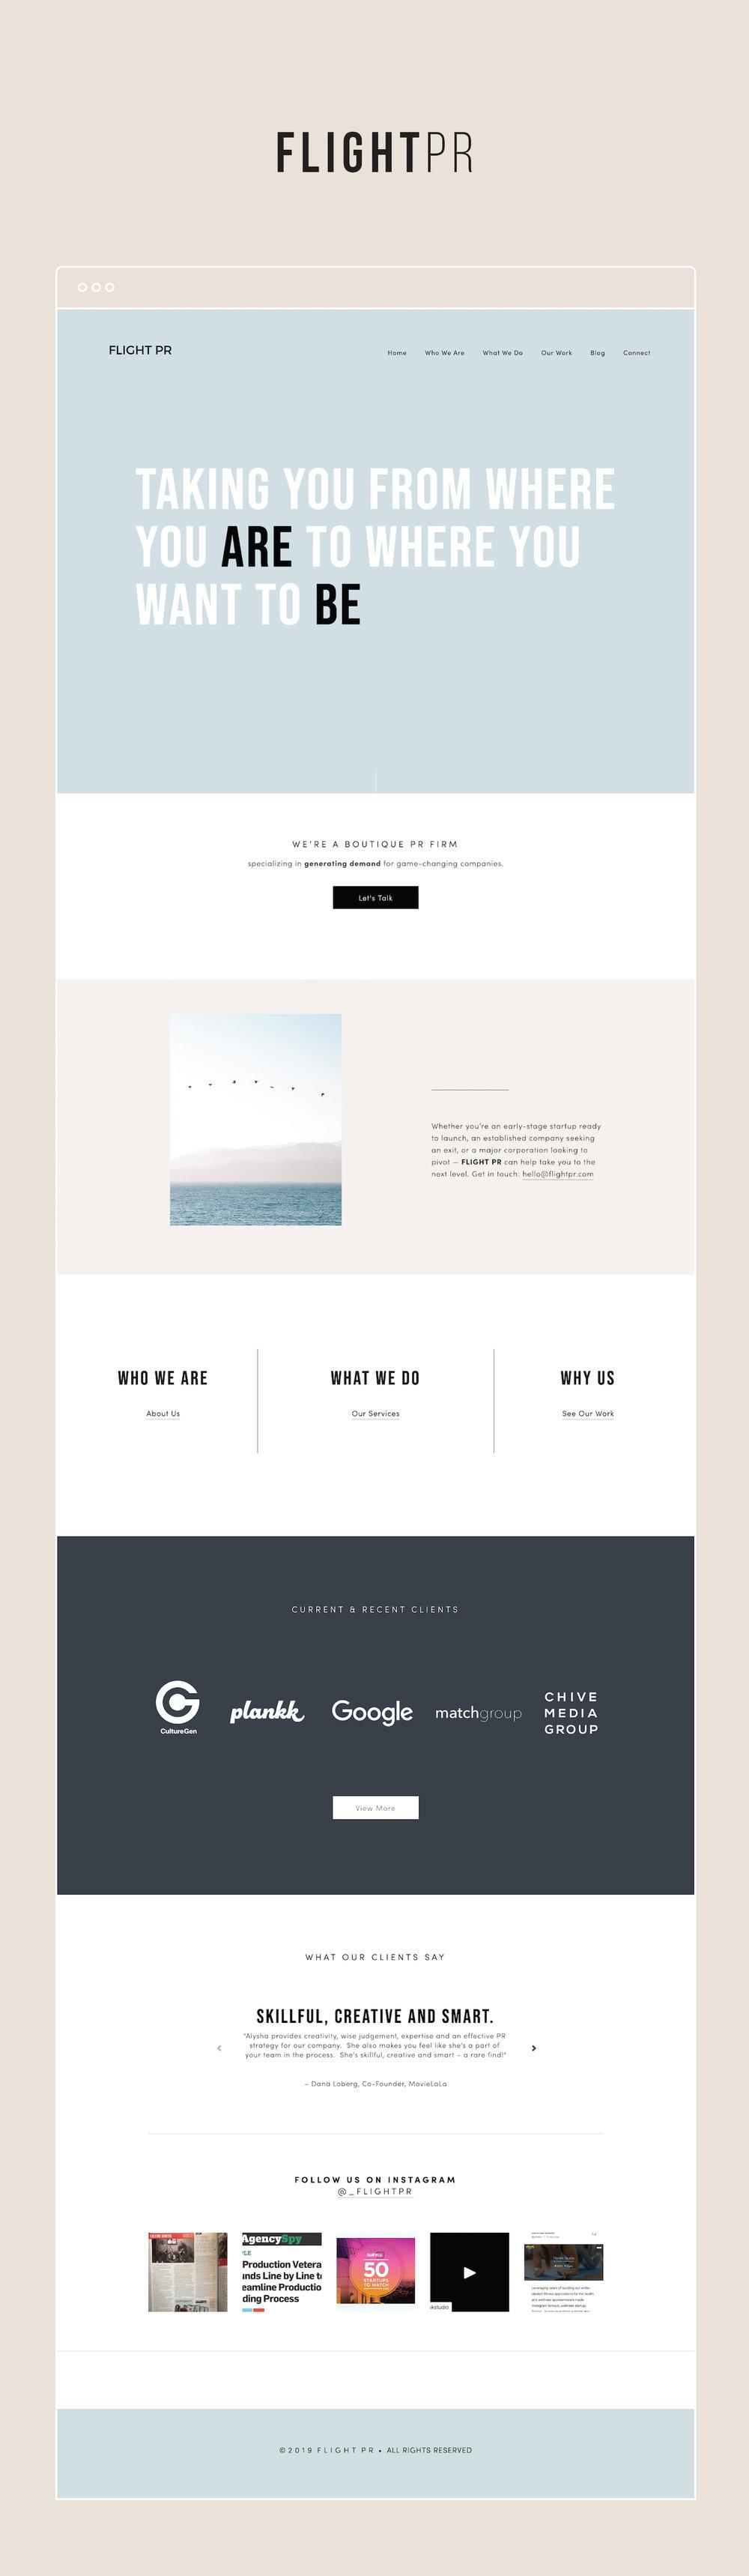 Custom,+Minimal,+Typography+Squarespace+Website+Design+_+By+GoLive.jpg